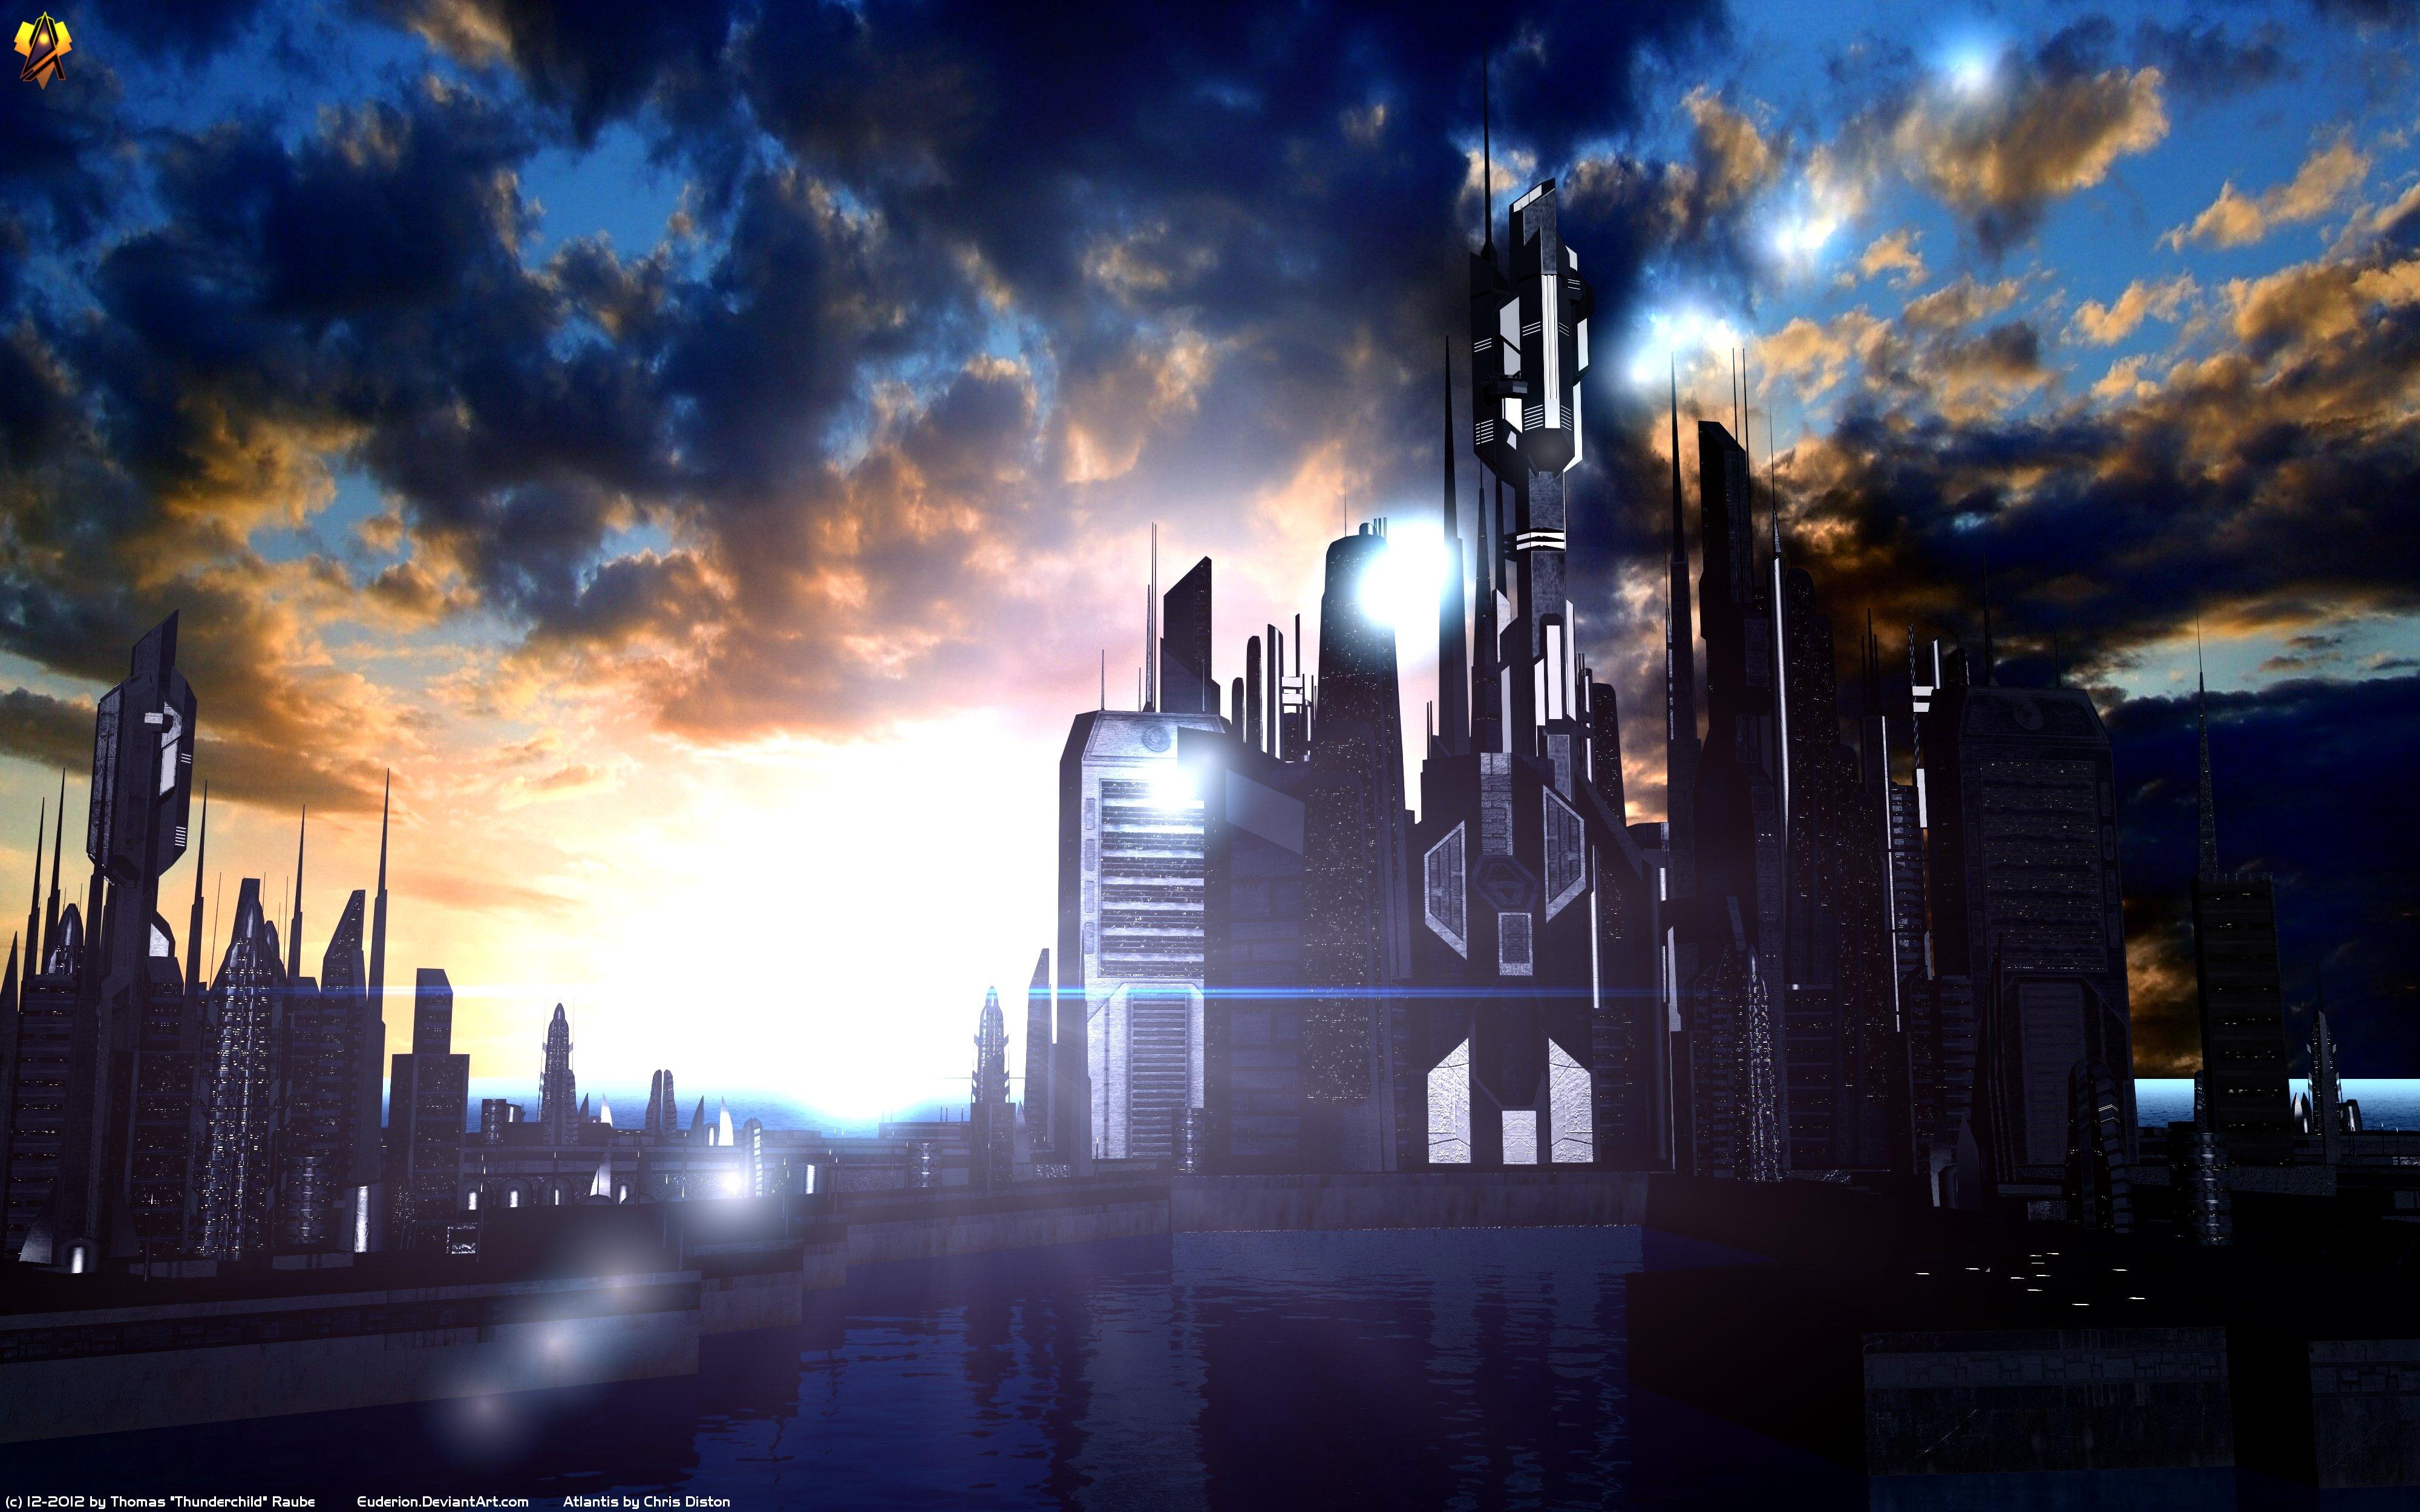 Journey deviantart com atlantis_sunset_by_euderion-d5nsn7k